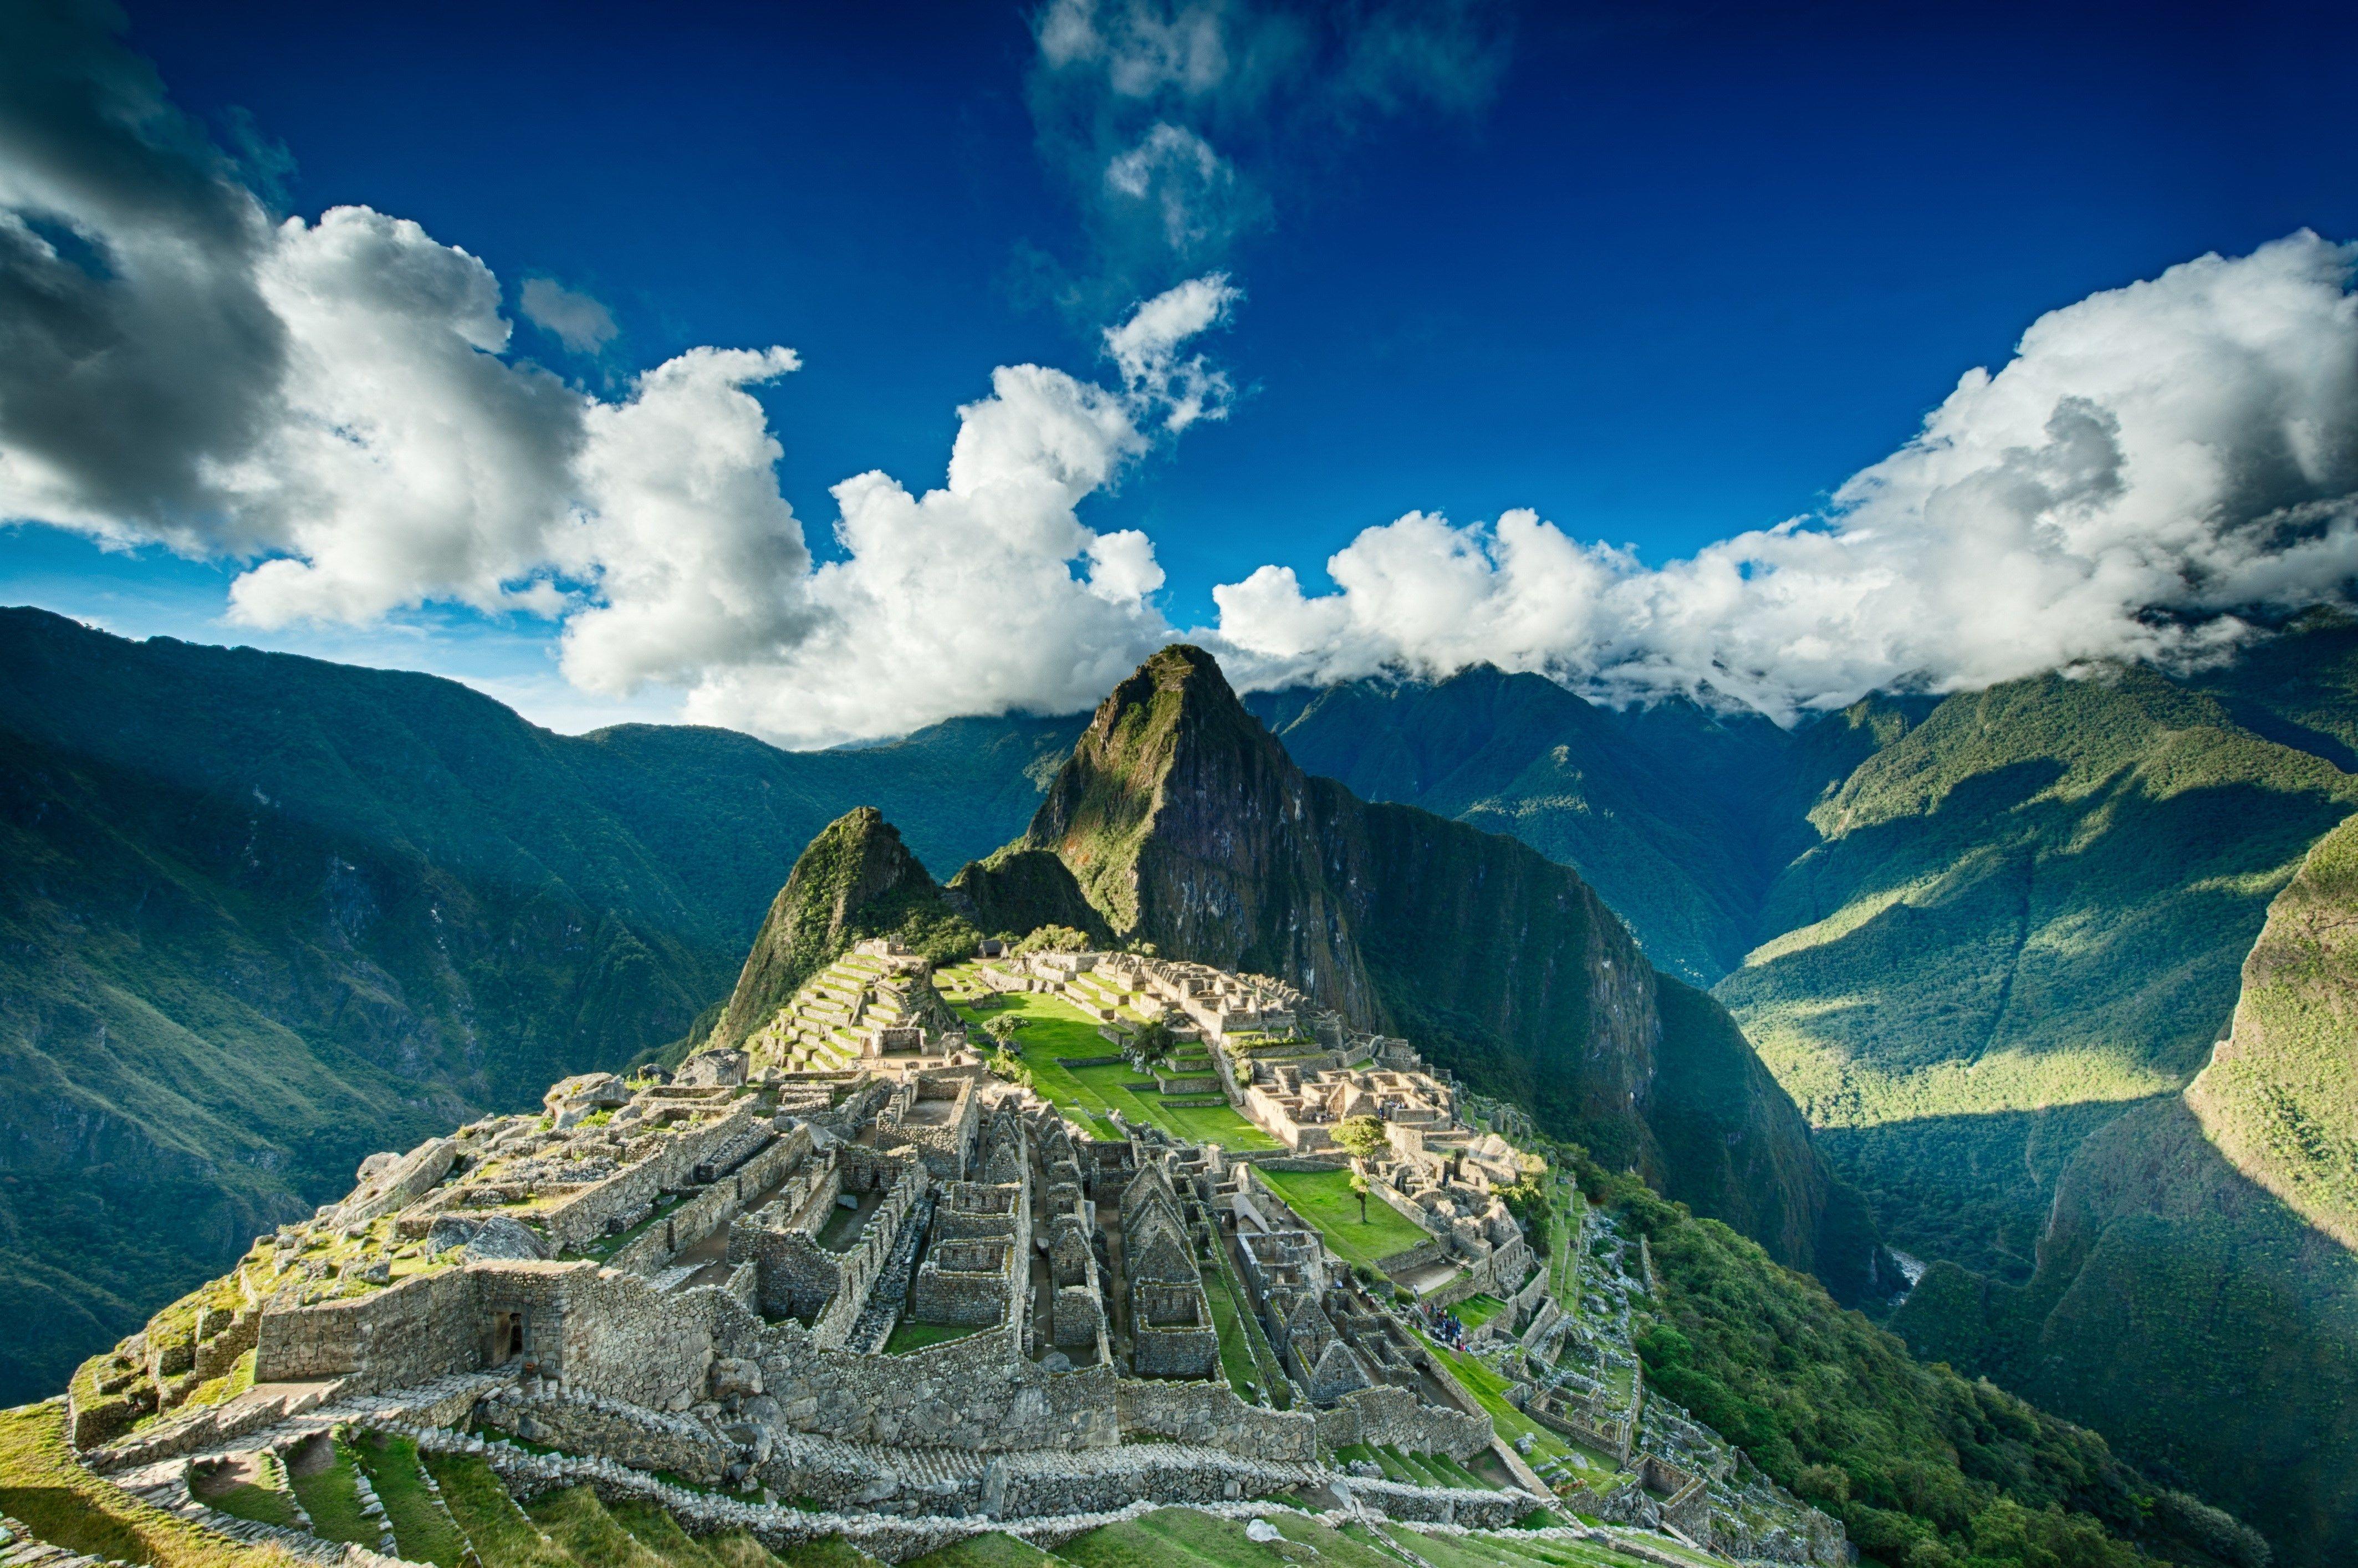 High Resolution Wallpaper Machu Picchu Zuid Amerika Amerika